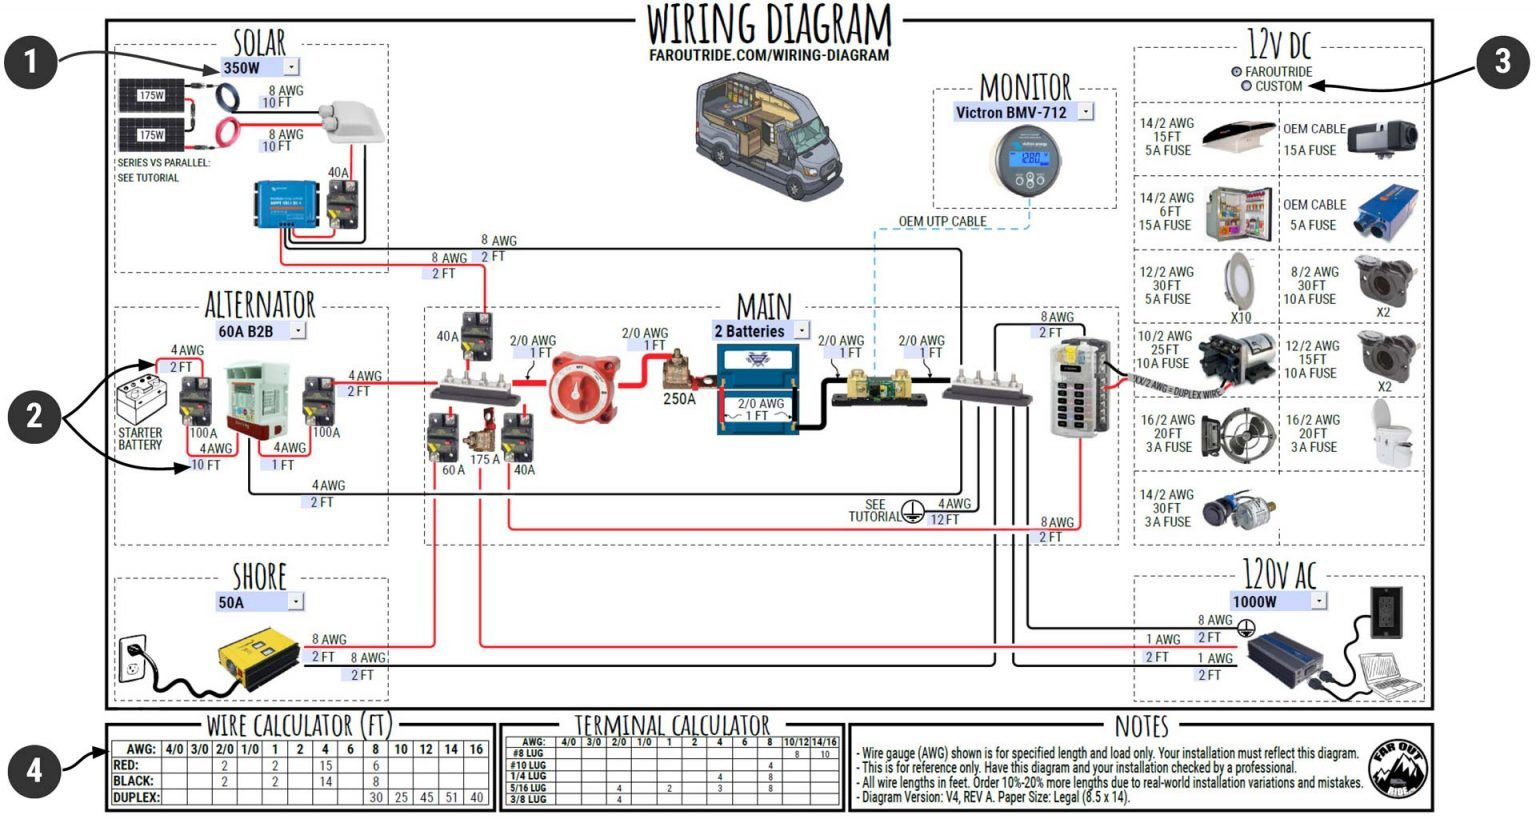 Wiring Diagram Tutorial For Camper Van Transit Sprinter Promaster Etc Pdf Faroutride Build A Camper Van Self Build Campervan Electrical Diagram